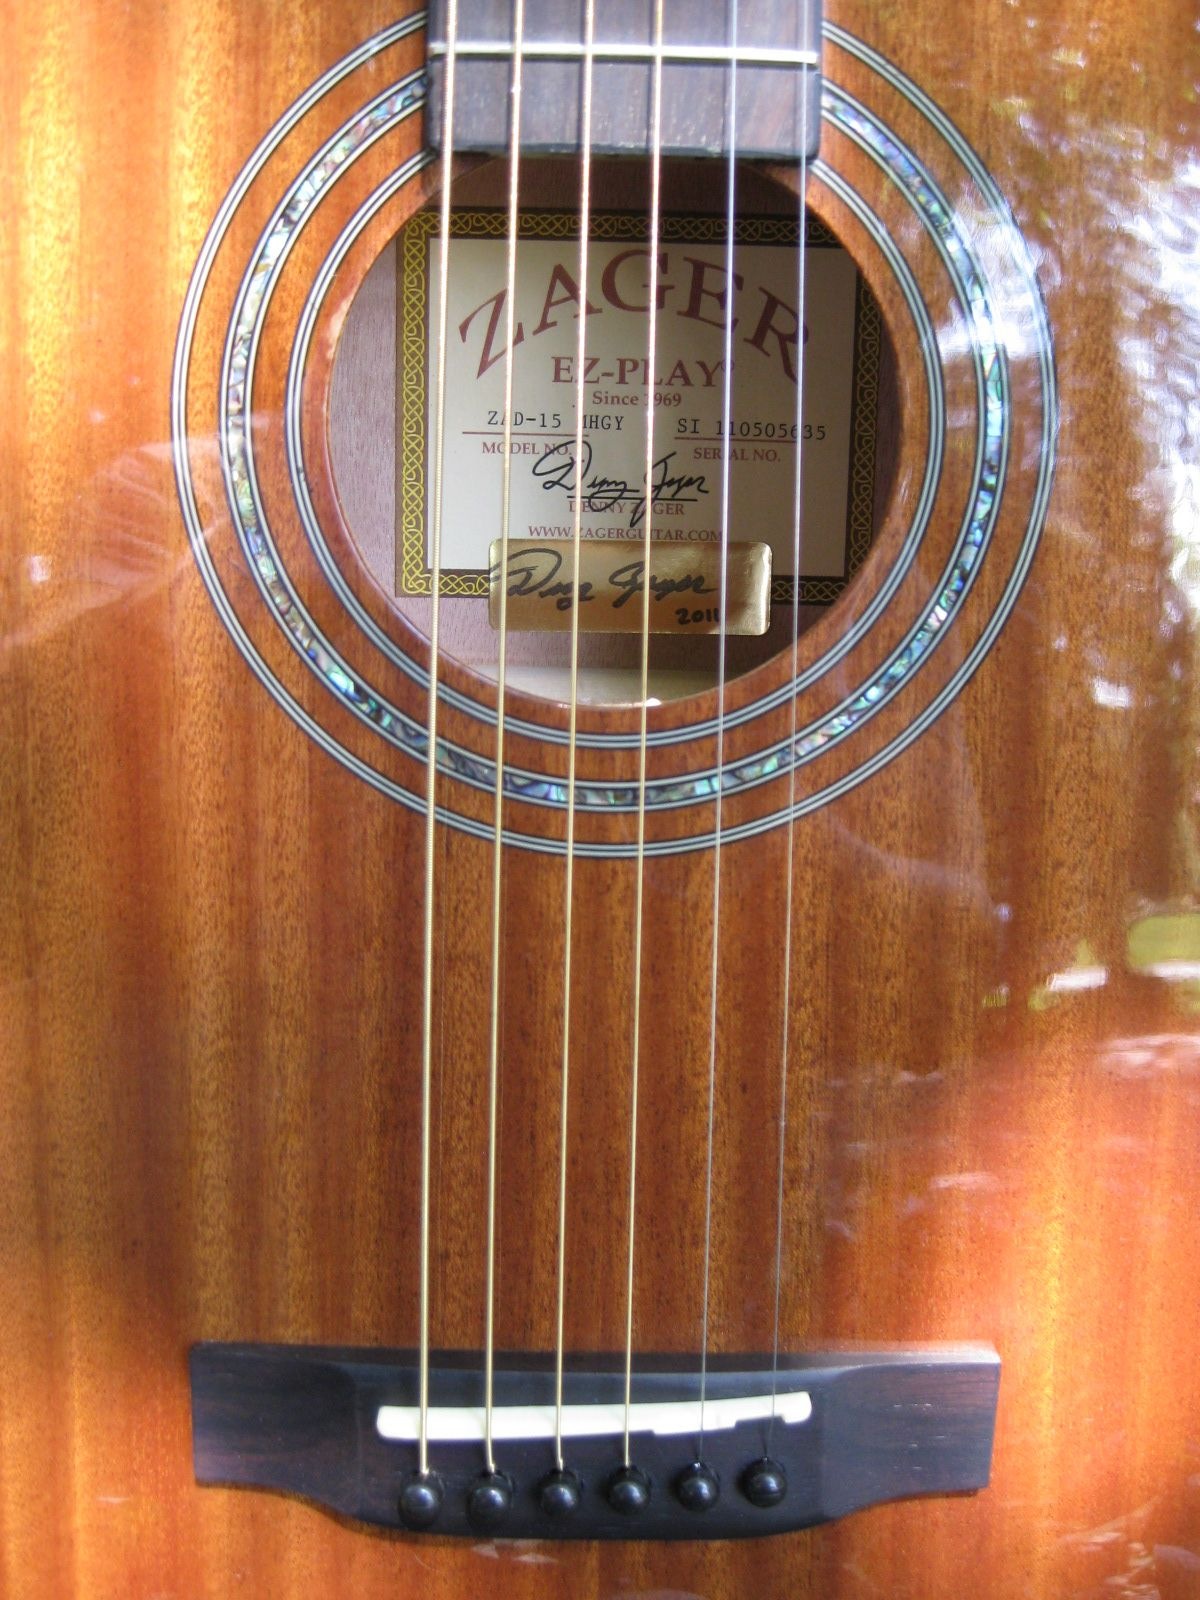 Zager Guitar Reviews Guitar Reviews Guitar Easy Play